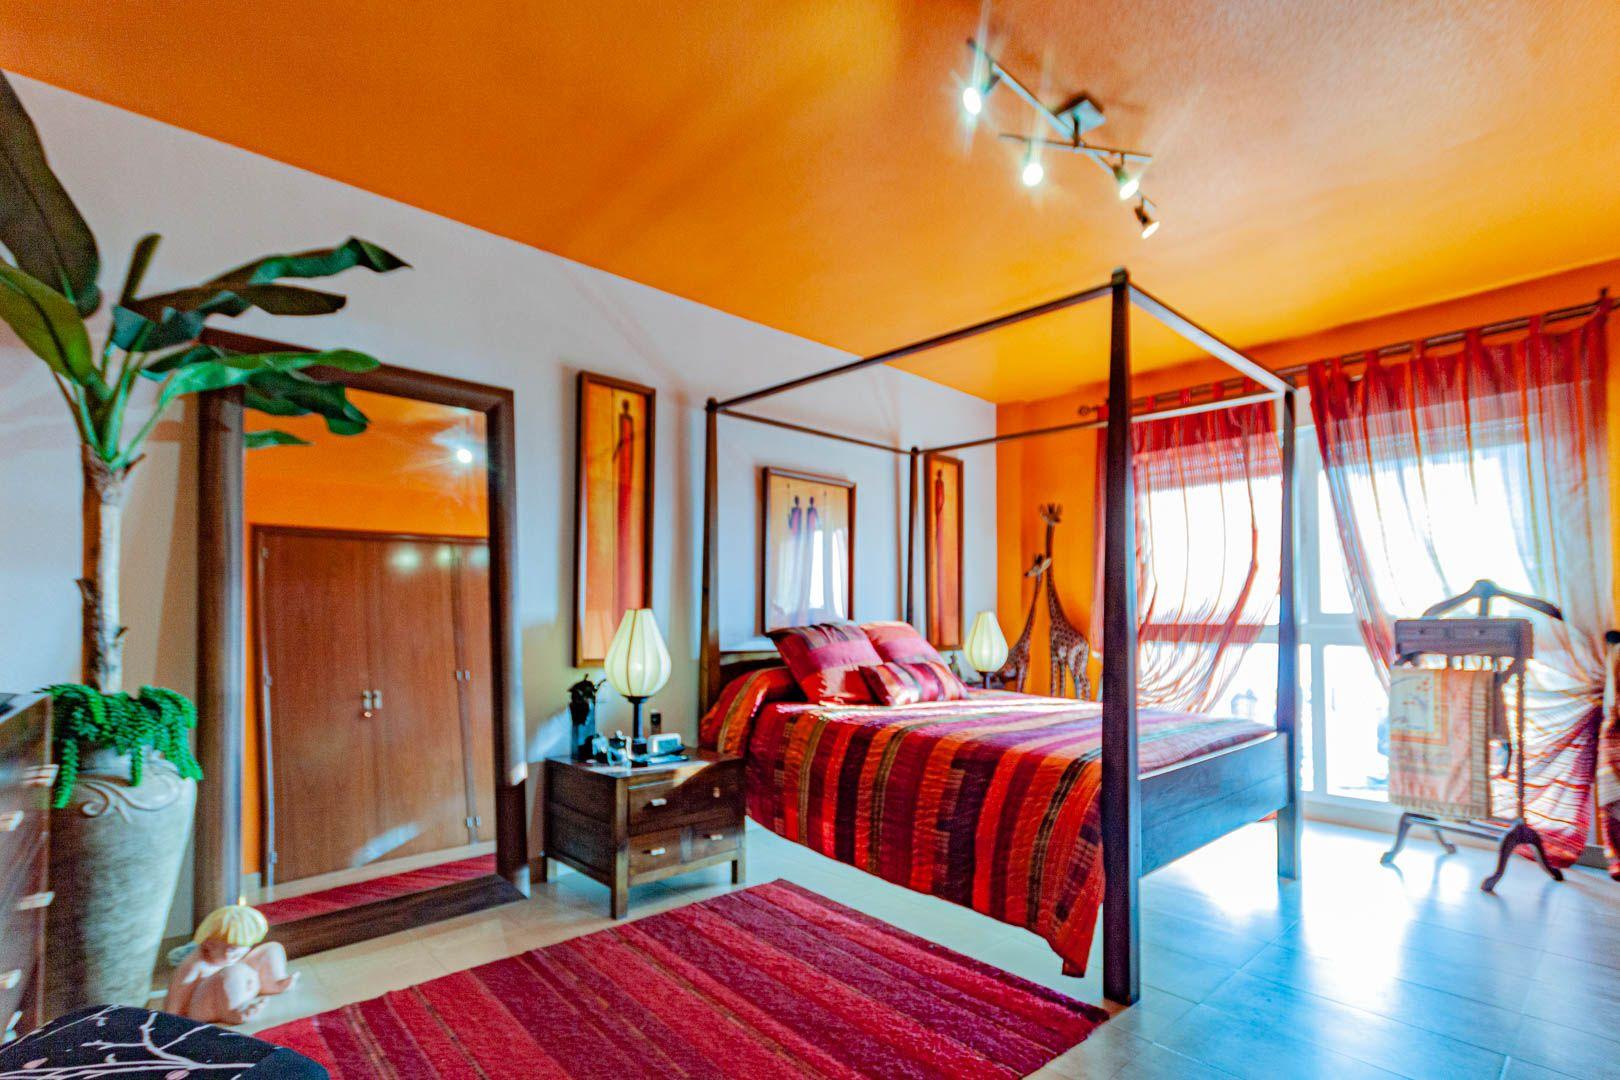 Apartamento en venta en San Javier zona La Manga del Mar Menor